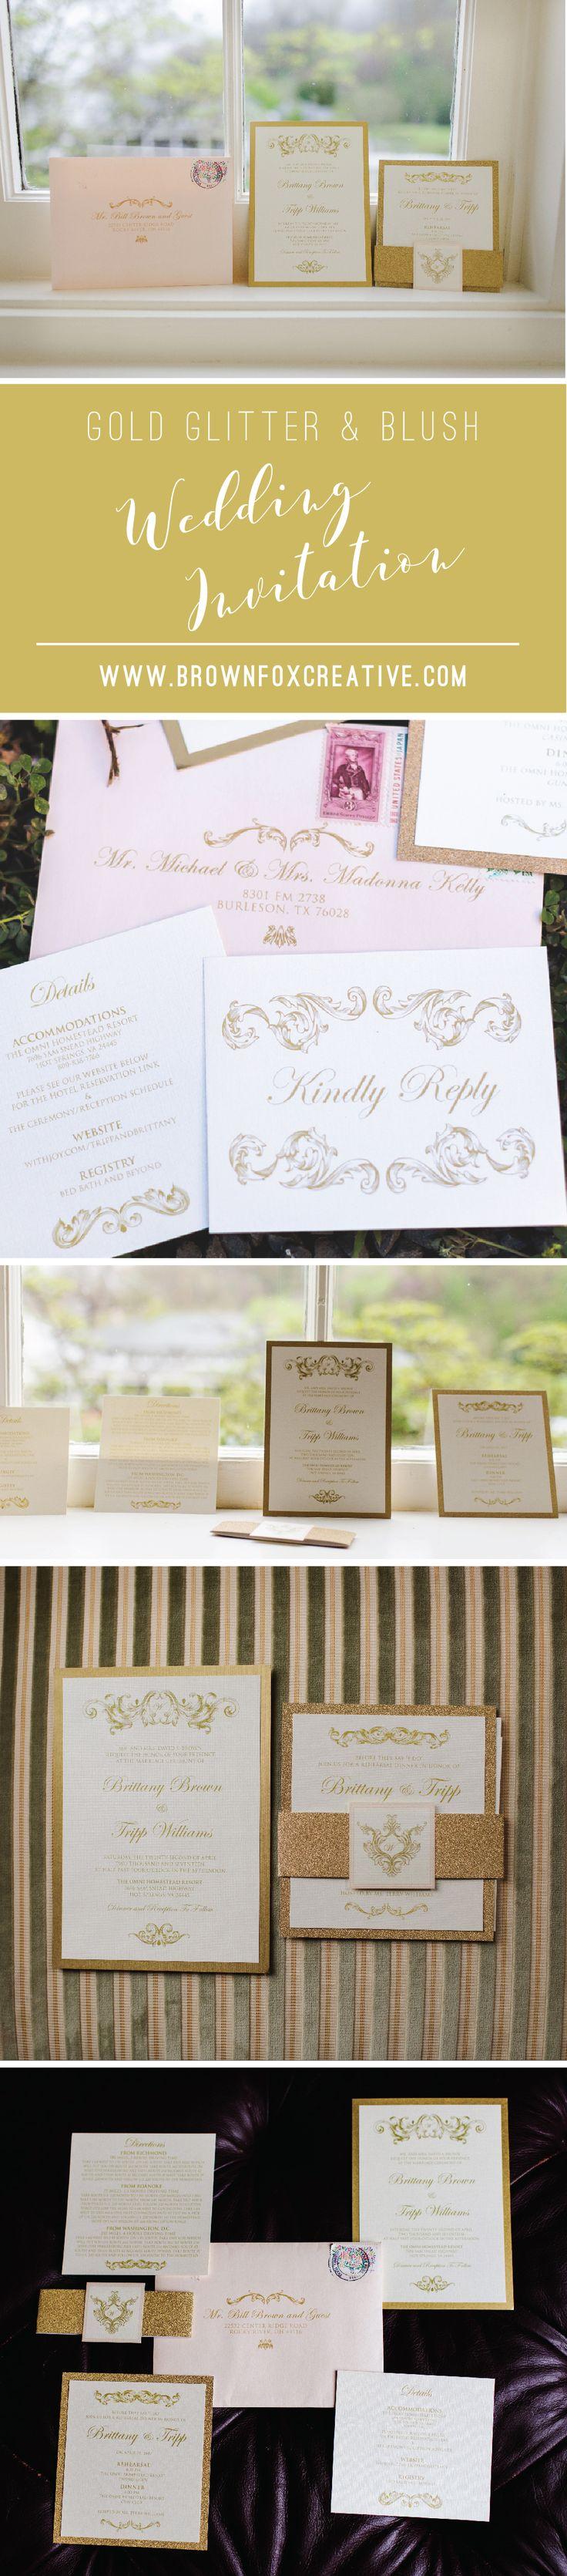 how to return address wedding envelopes%0A Traditional Formal Vintage Gold Glitter and Pink Blush Rose Wedding  Invitation with Enclosure Band  u     Return Address Printing